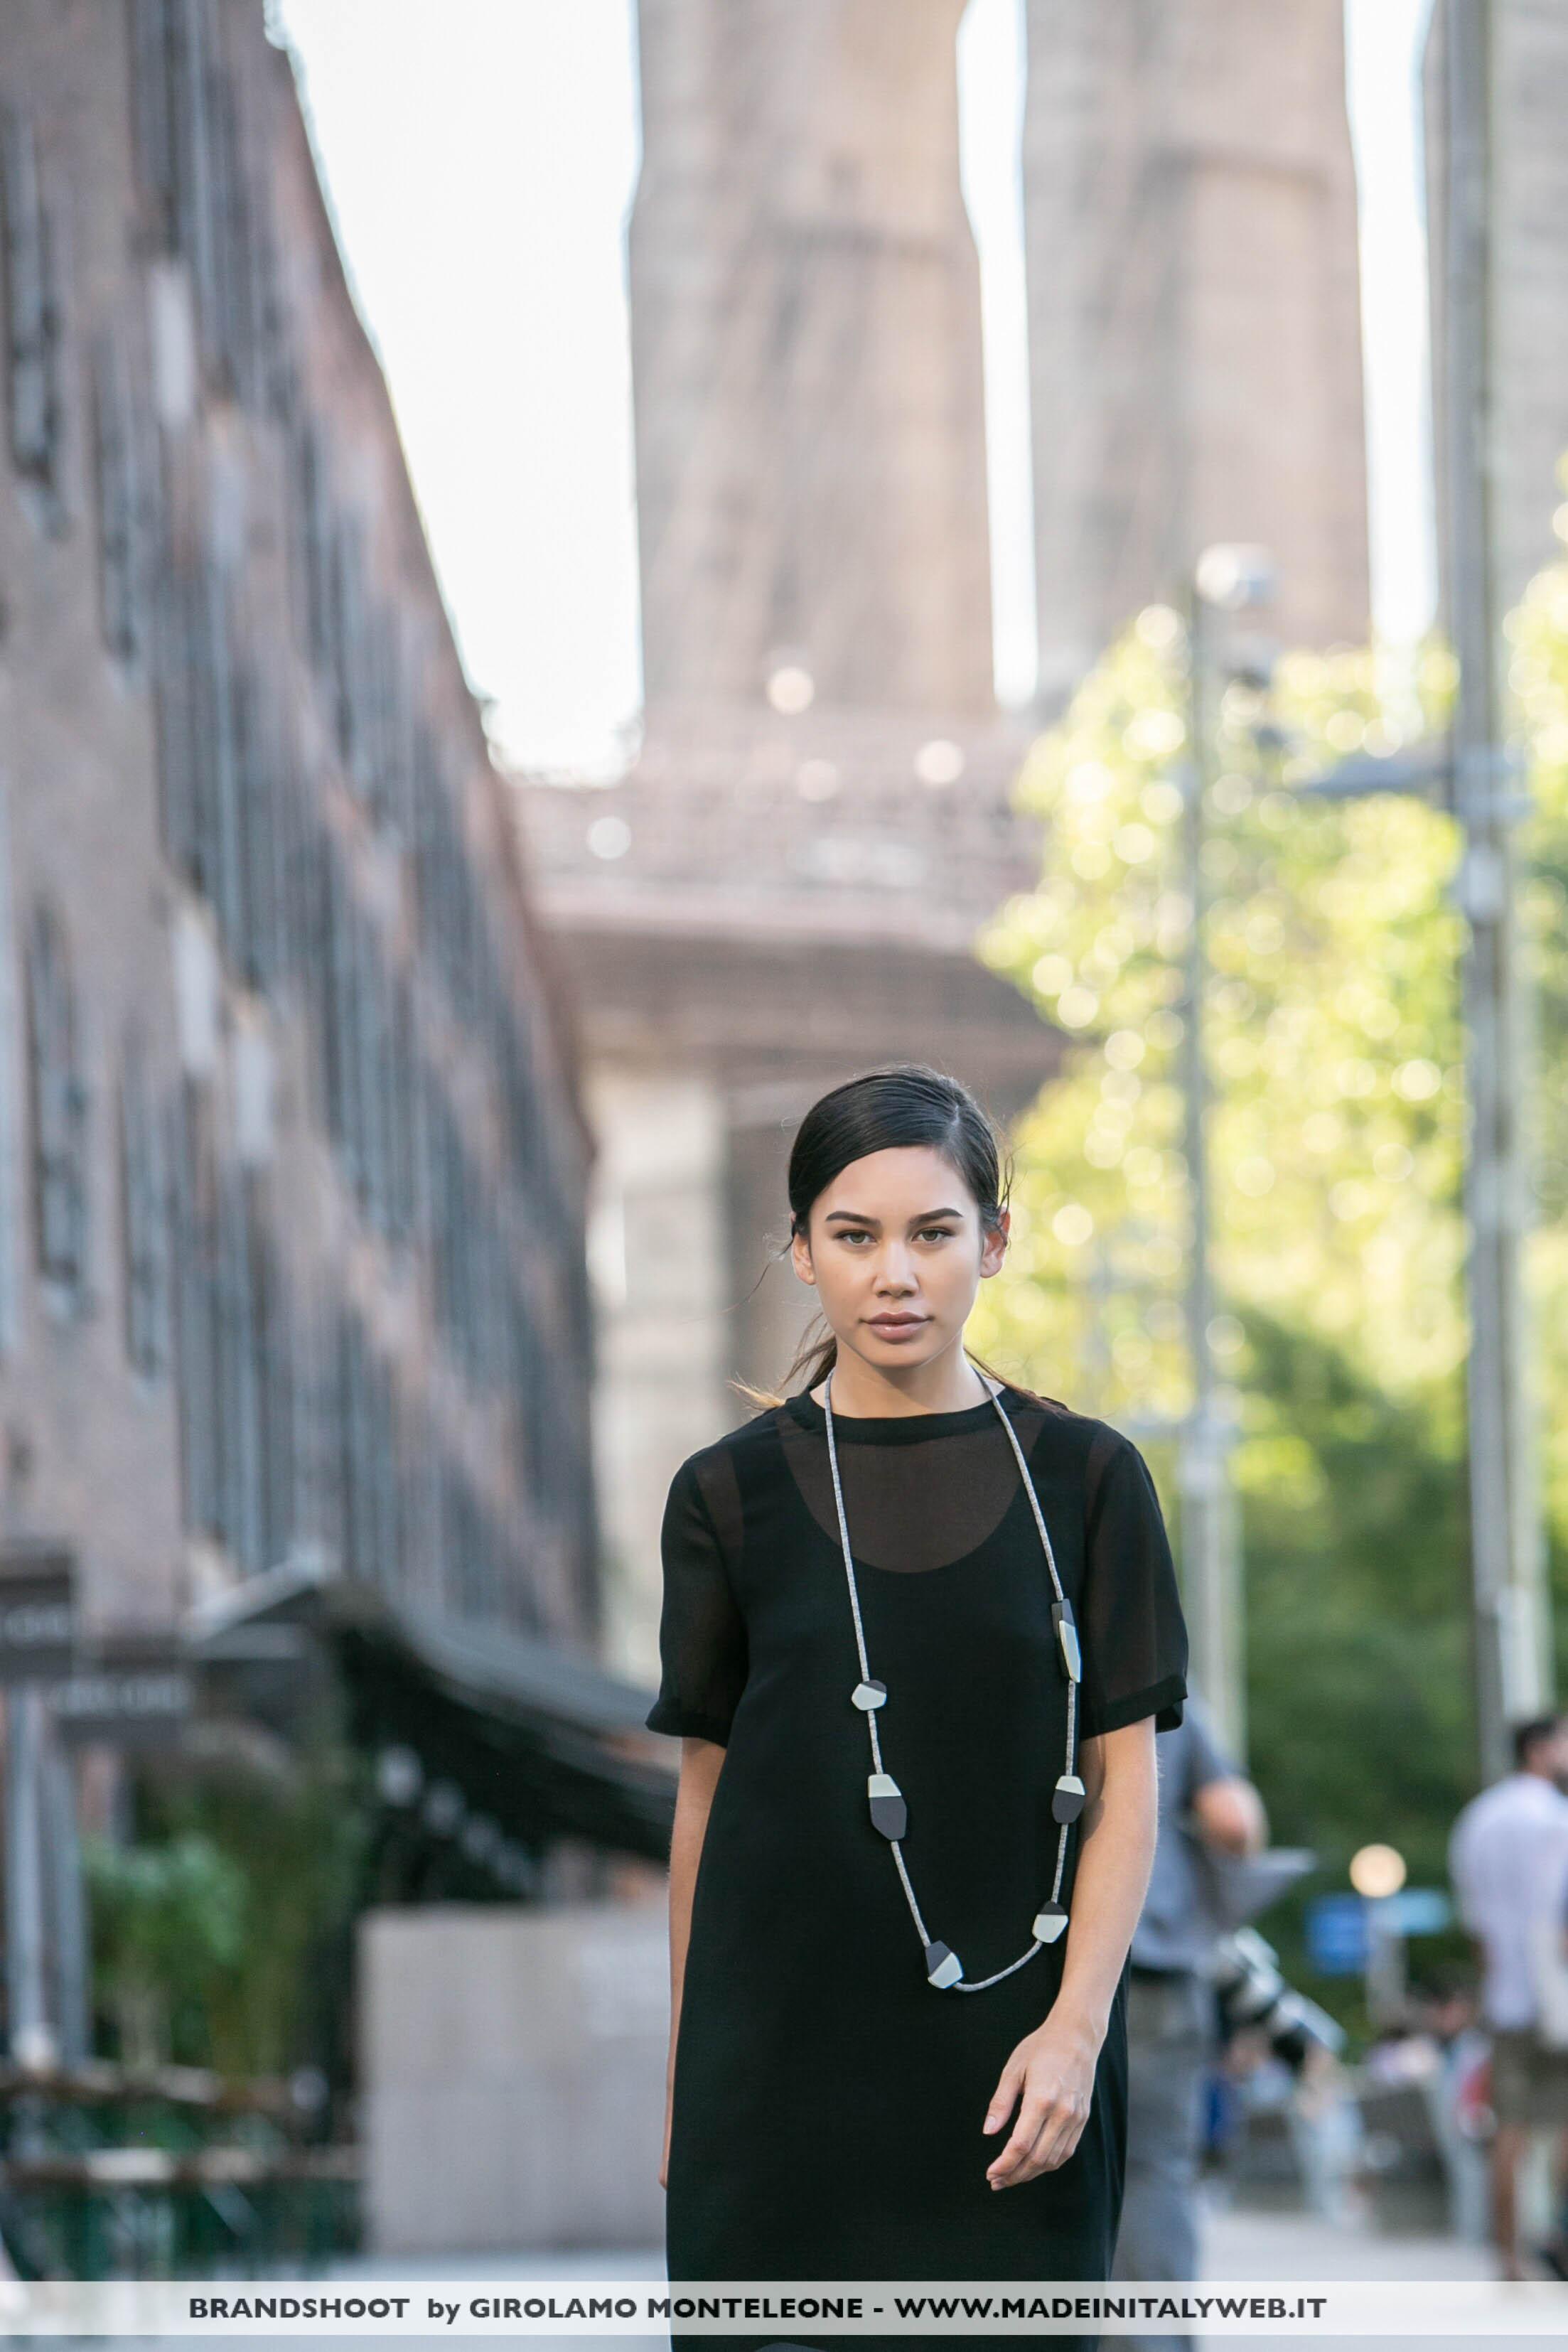 fashion street photographer NEWYORK ROMA CADOCAP NEW_YORK_GIROLAMO_MONTELEONE_2018ottobre032231081399_IMG_9321